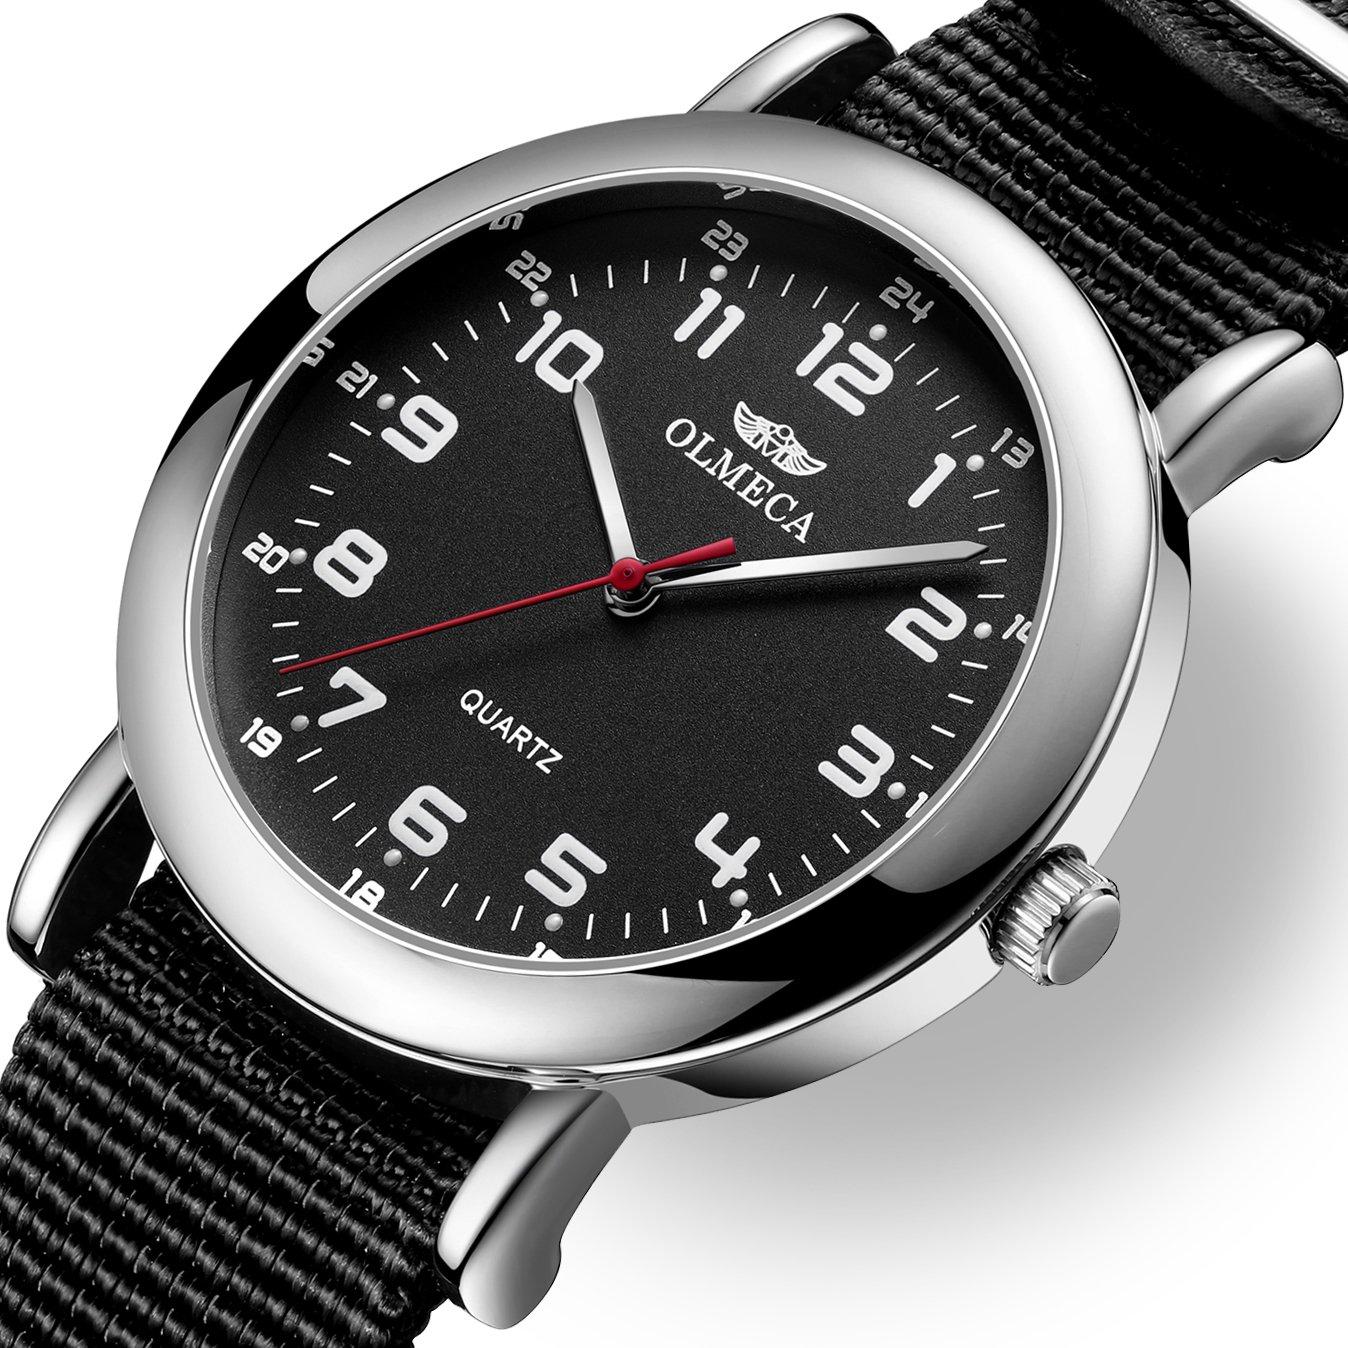 Amazon.com: OLMECA Mens Watches Luxury Wristwatches Fashion Design Dial - Japanese Quartz Movement - Replaceable Multi-Color Striped Nylon Band - Black ...